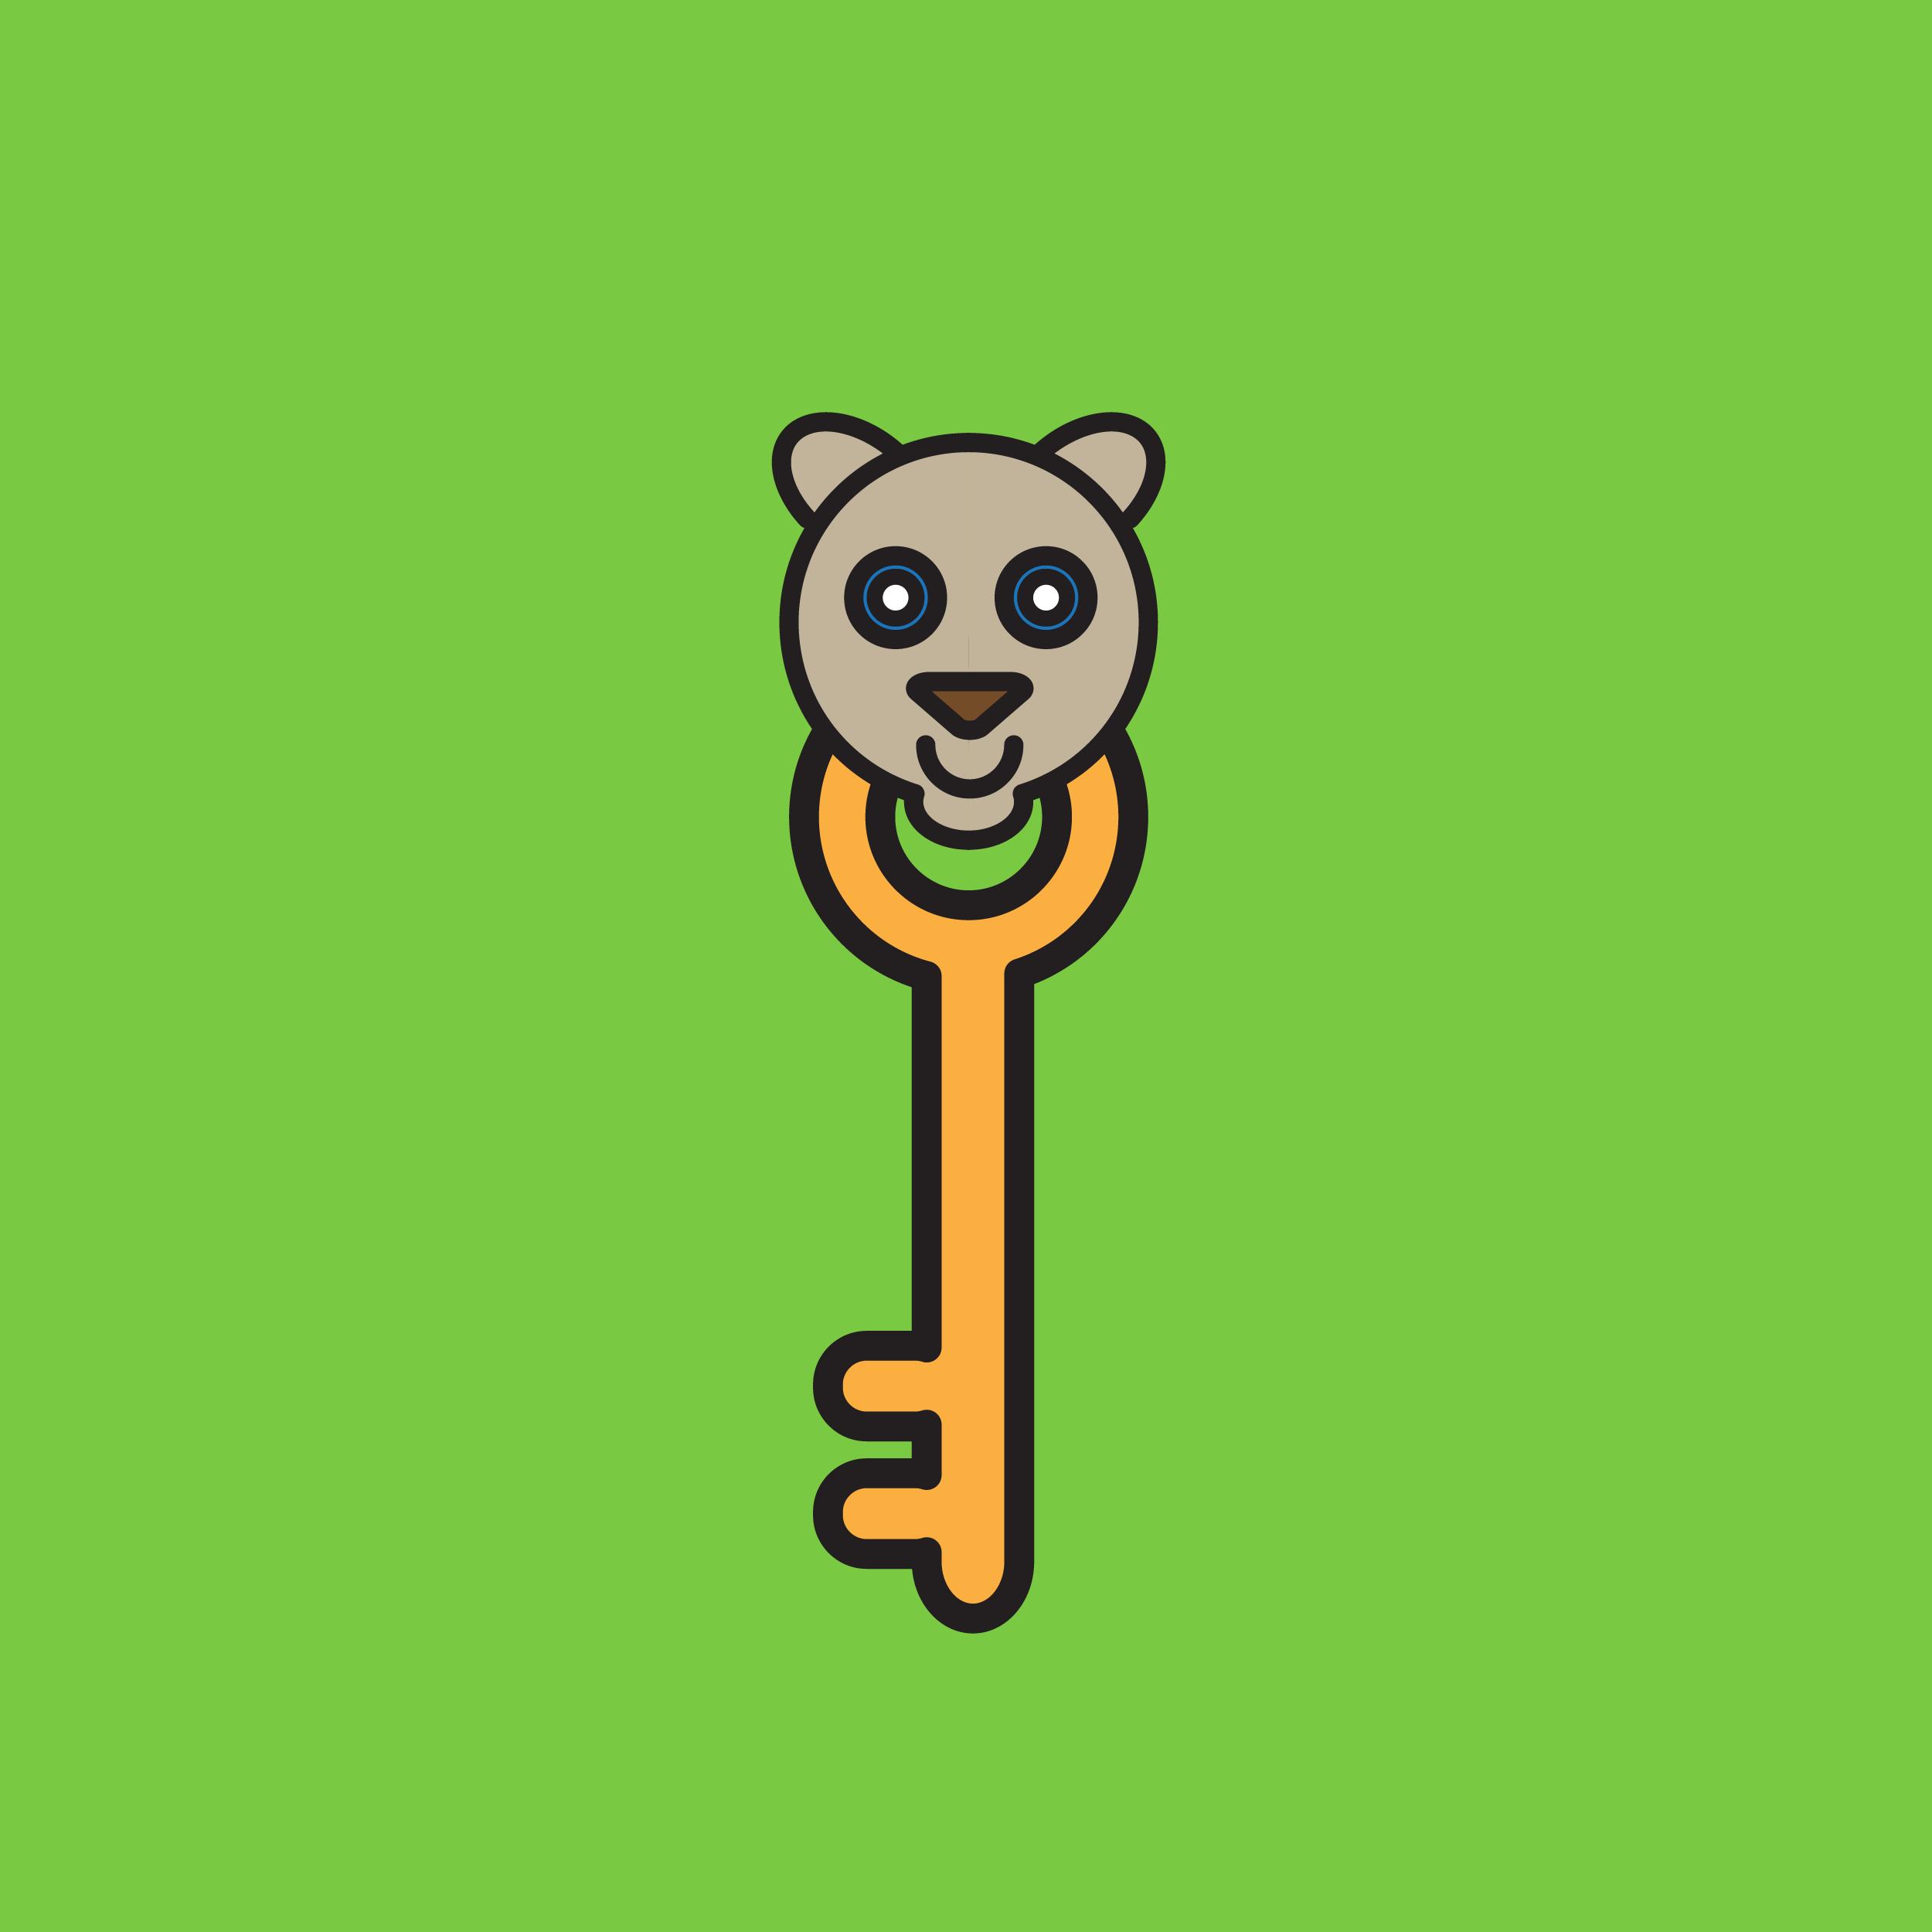 Cougar-01.png